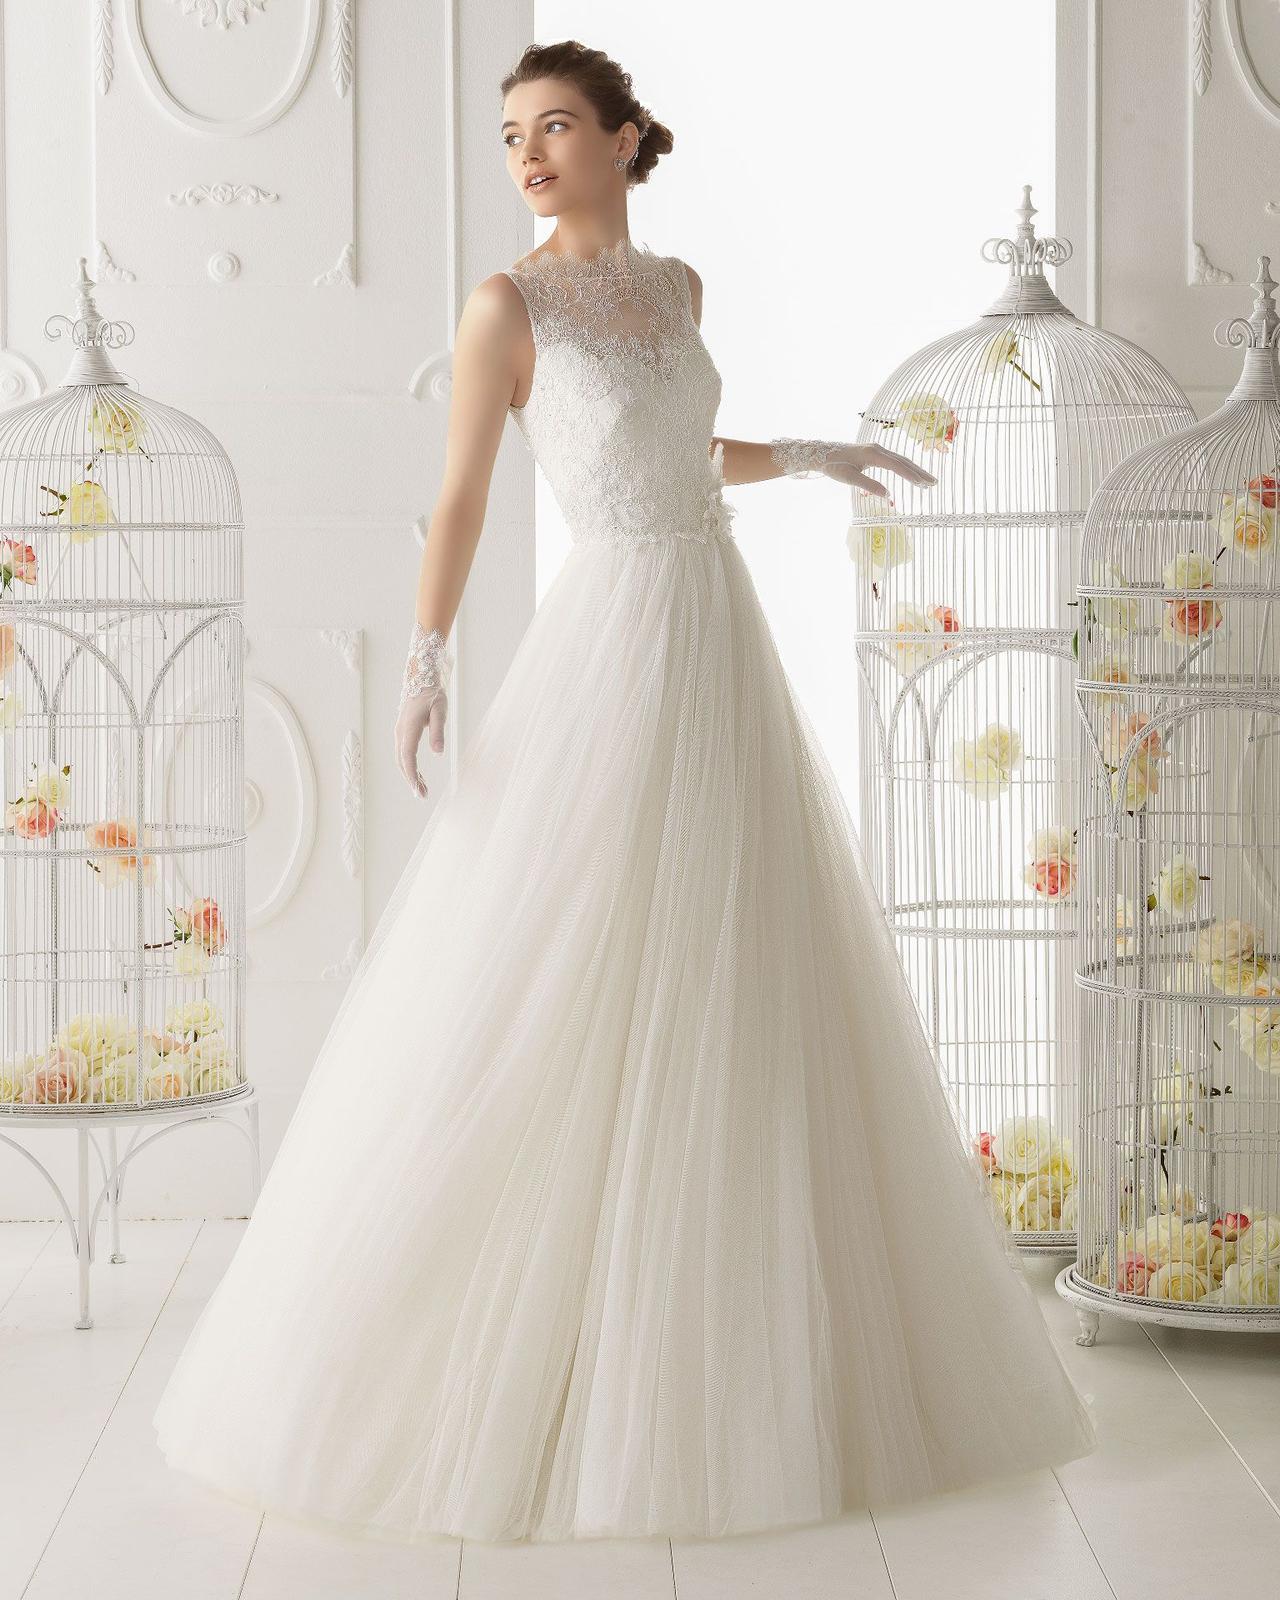 Svadobné šaty AIRE BARCELONA - Obrázok č. 1